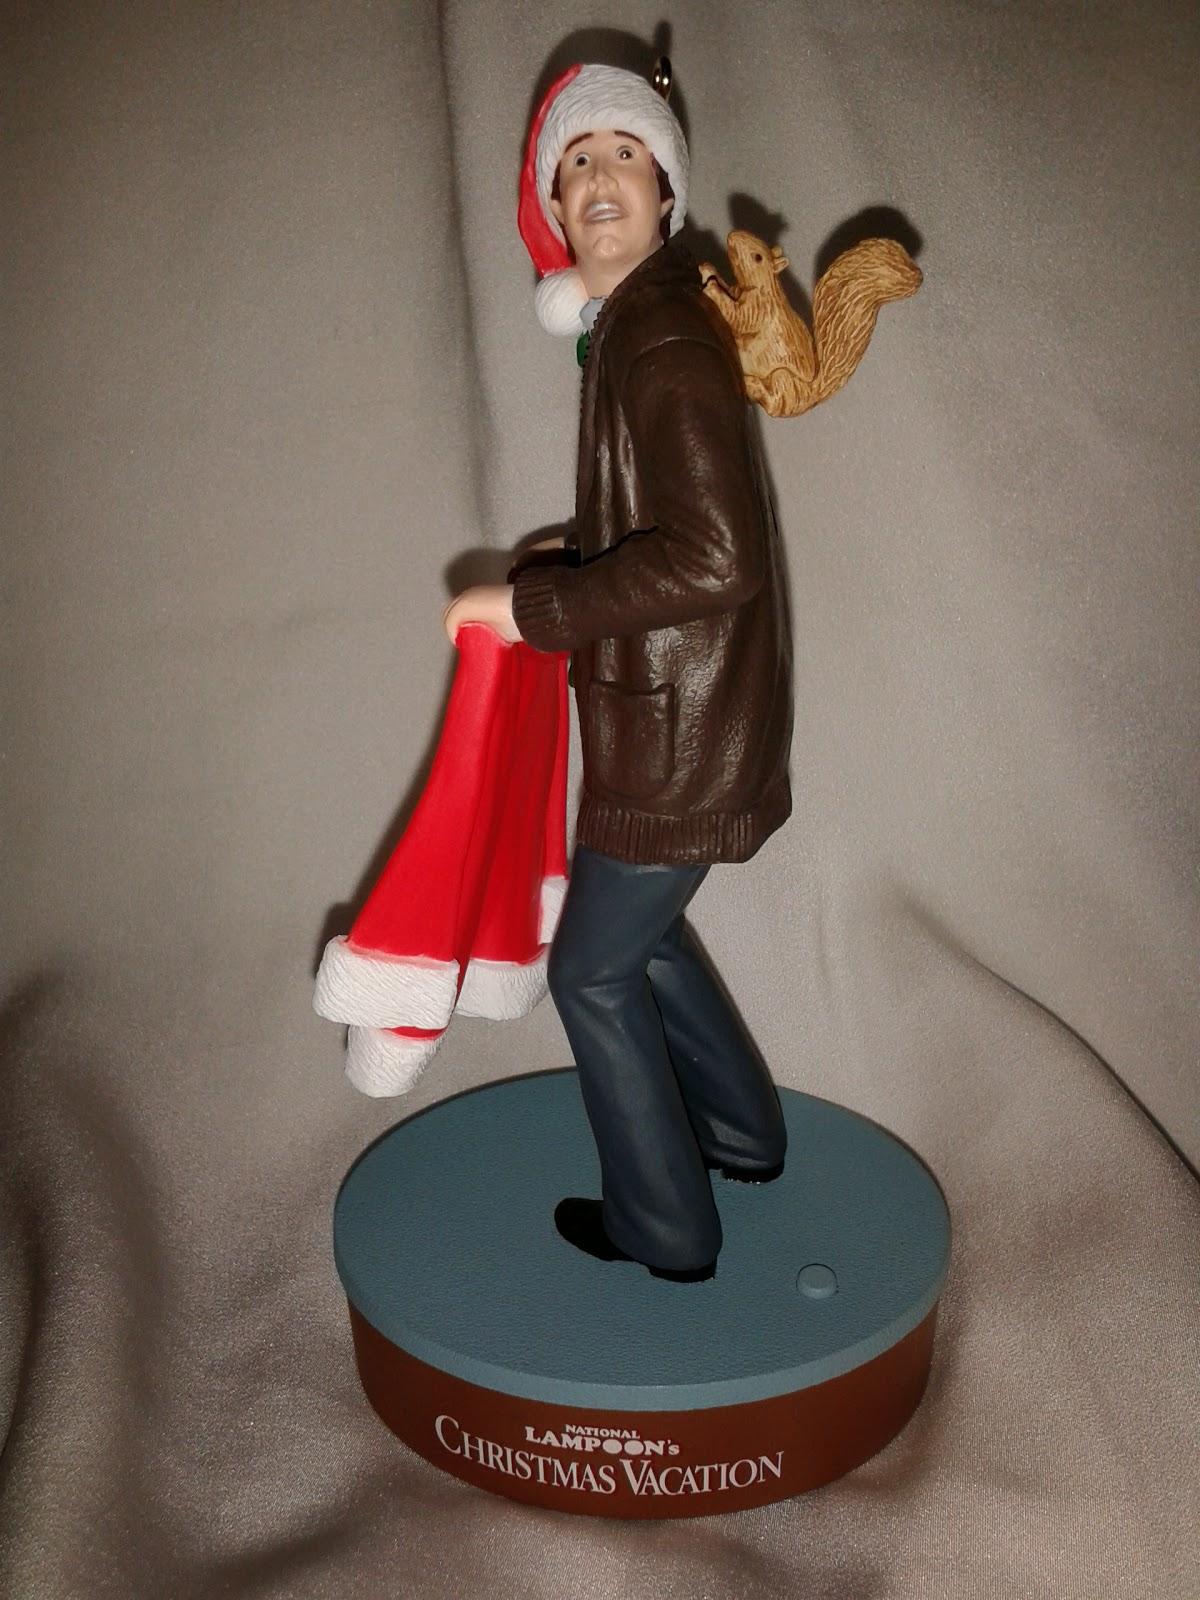 http://www.hallmark.com/keepsake-ornaments/